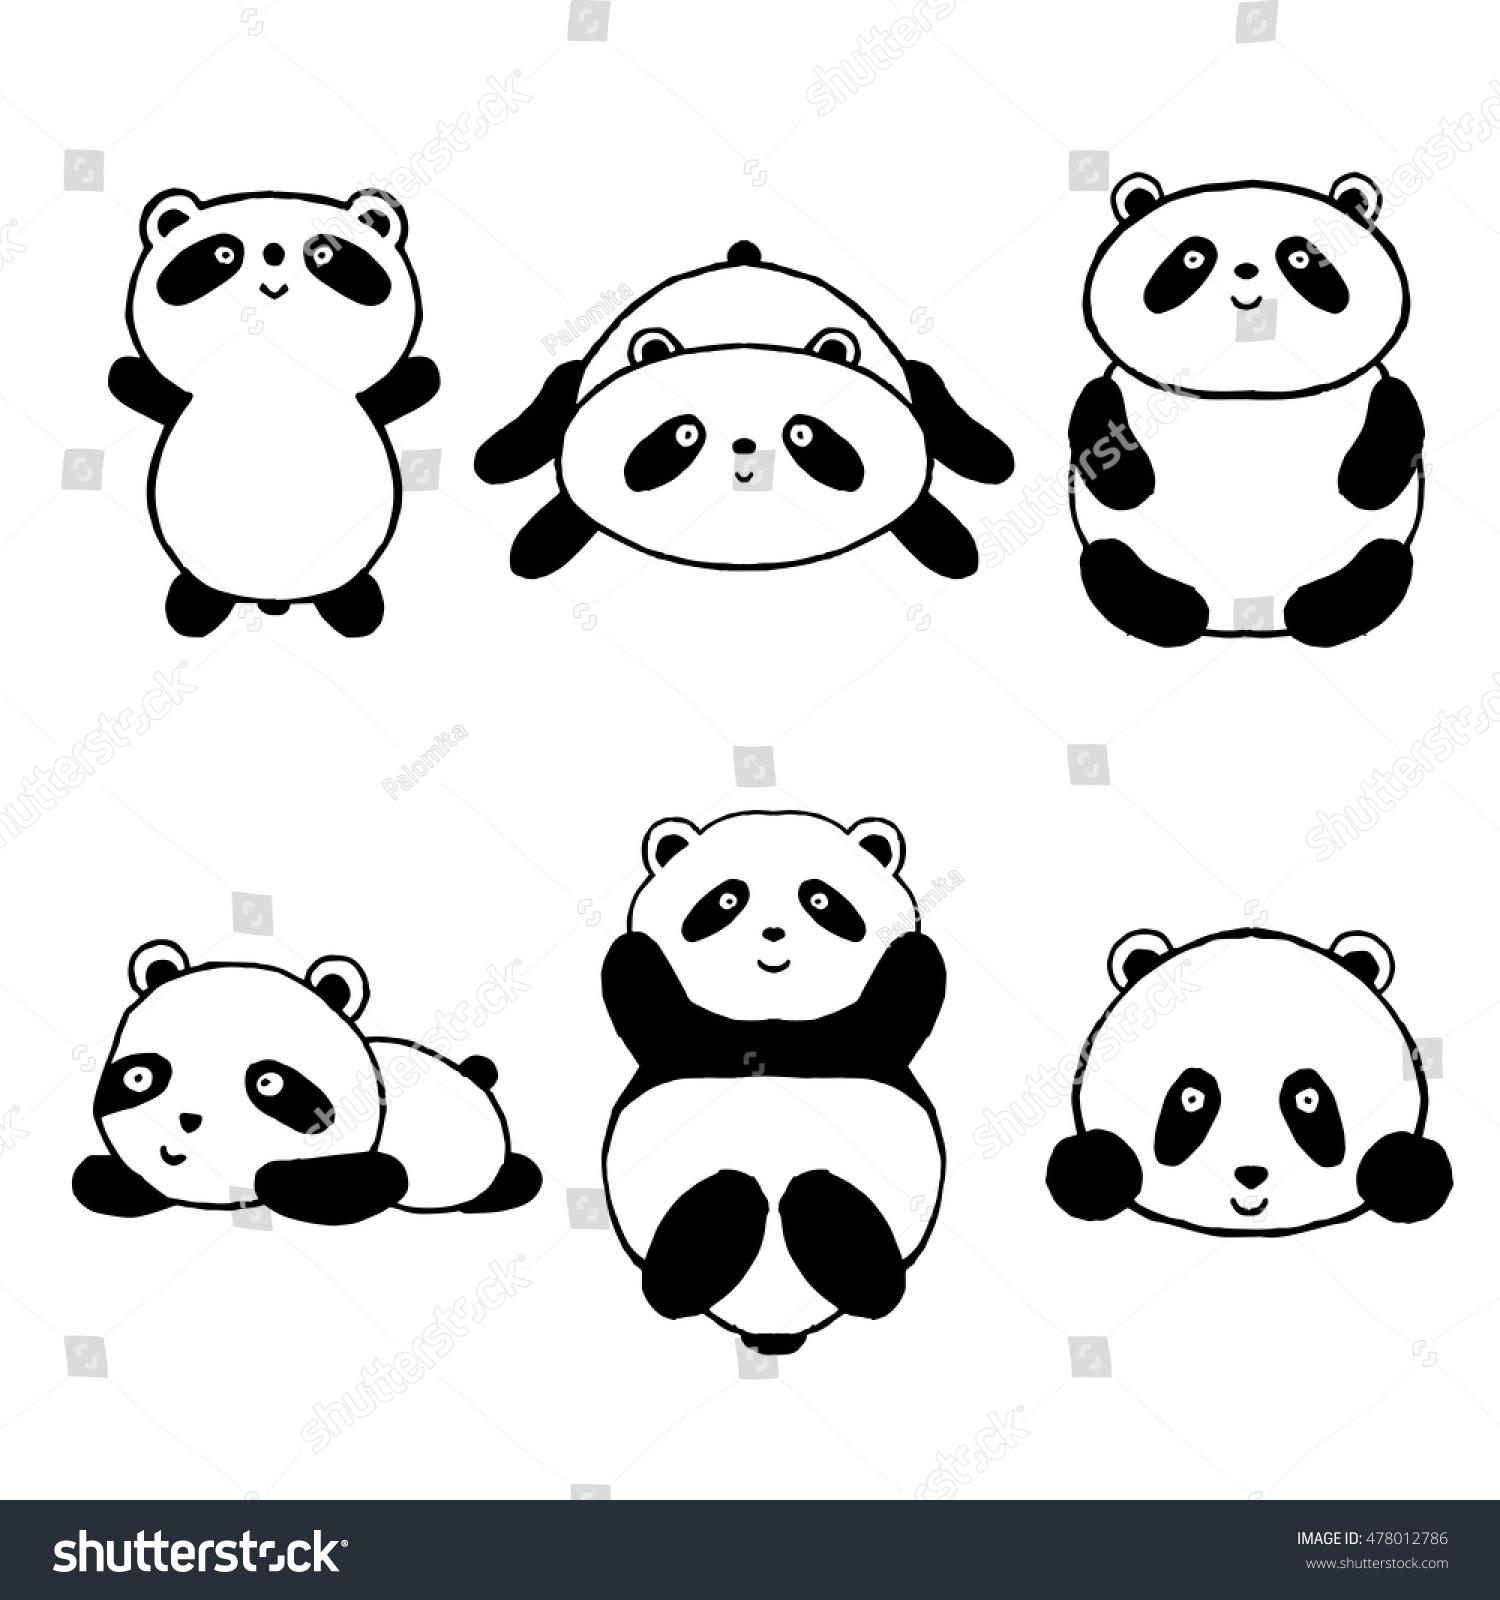 Cute Cartoon Panda Set Icons Black Stock Vector Royalty Free 478012786